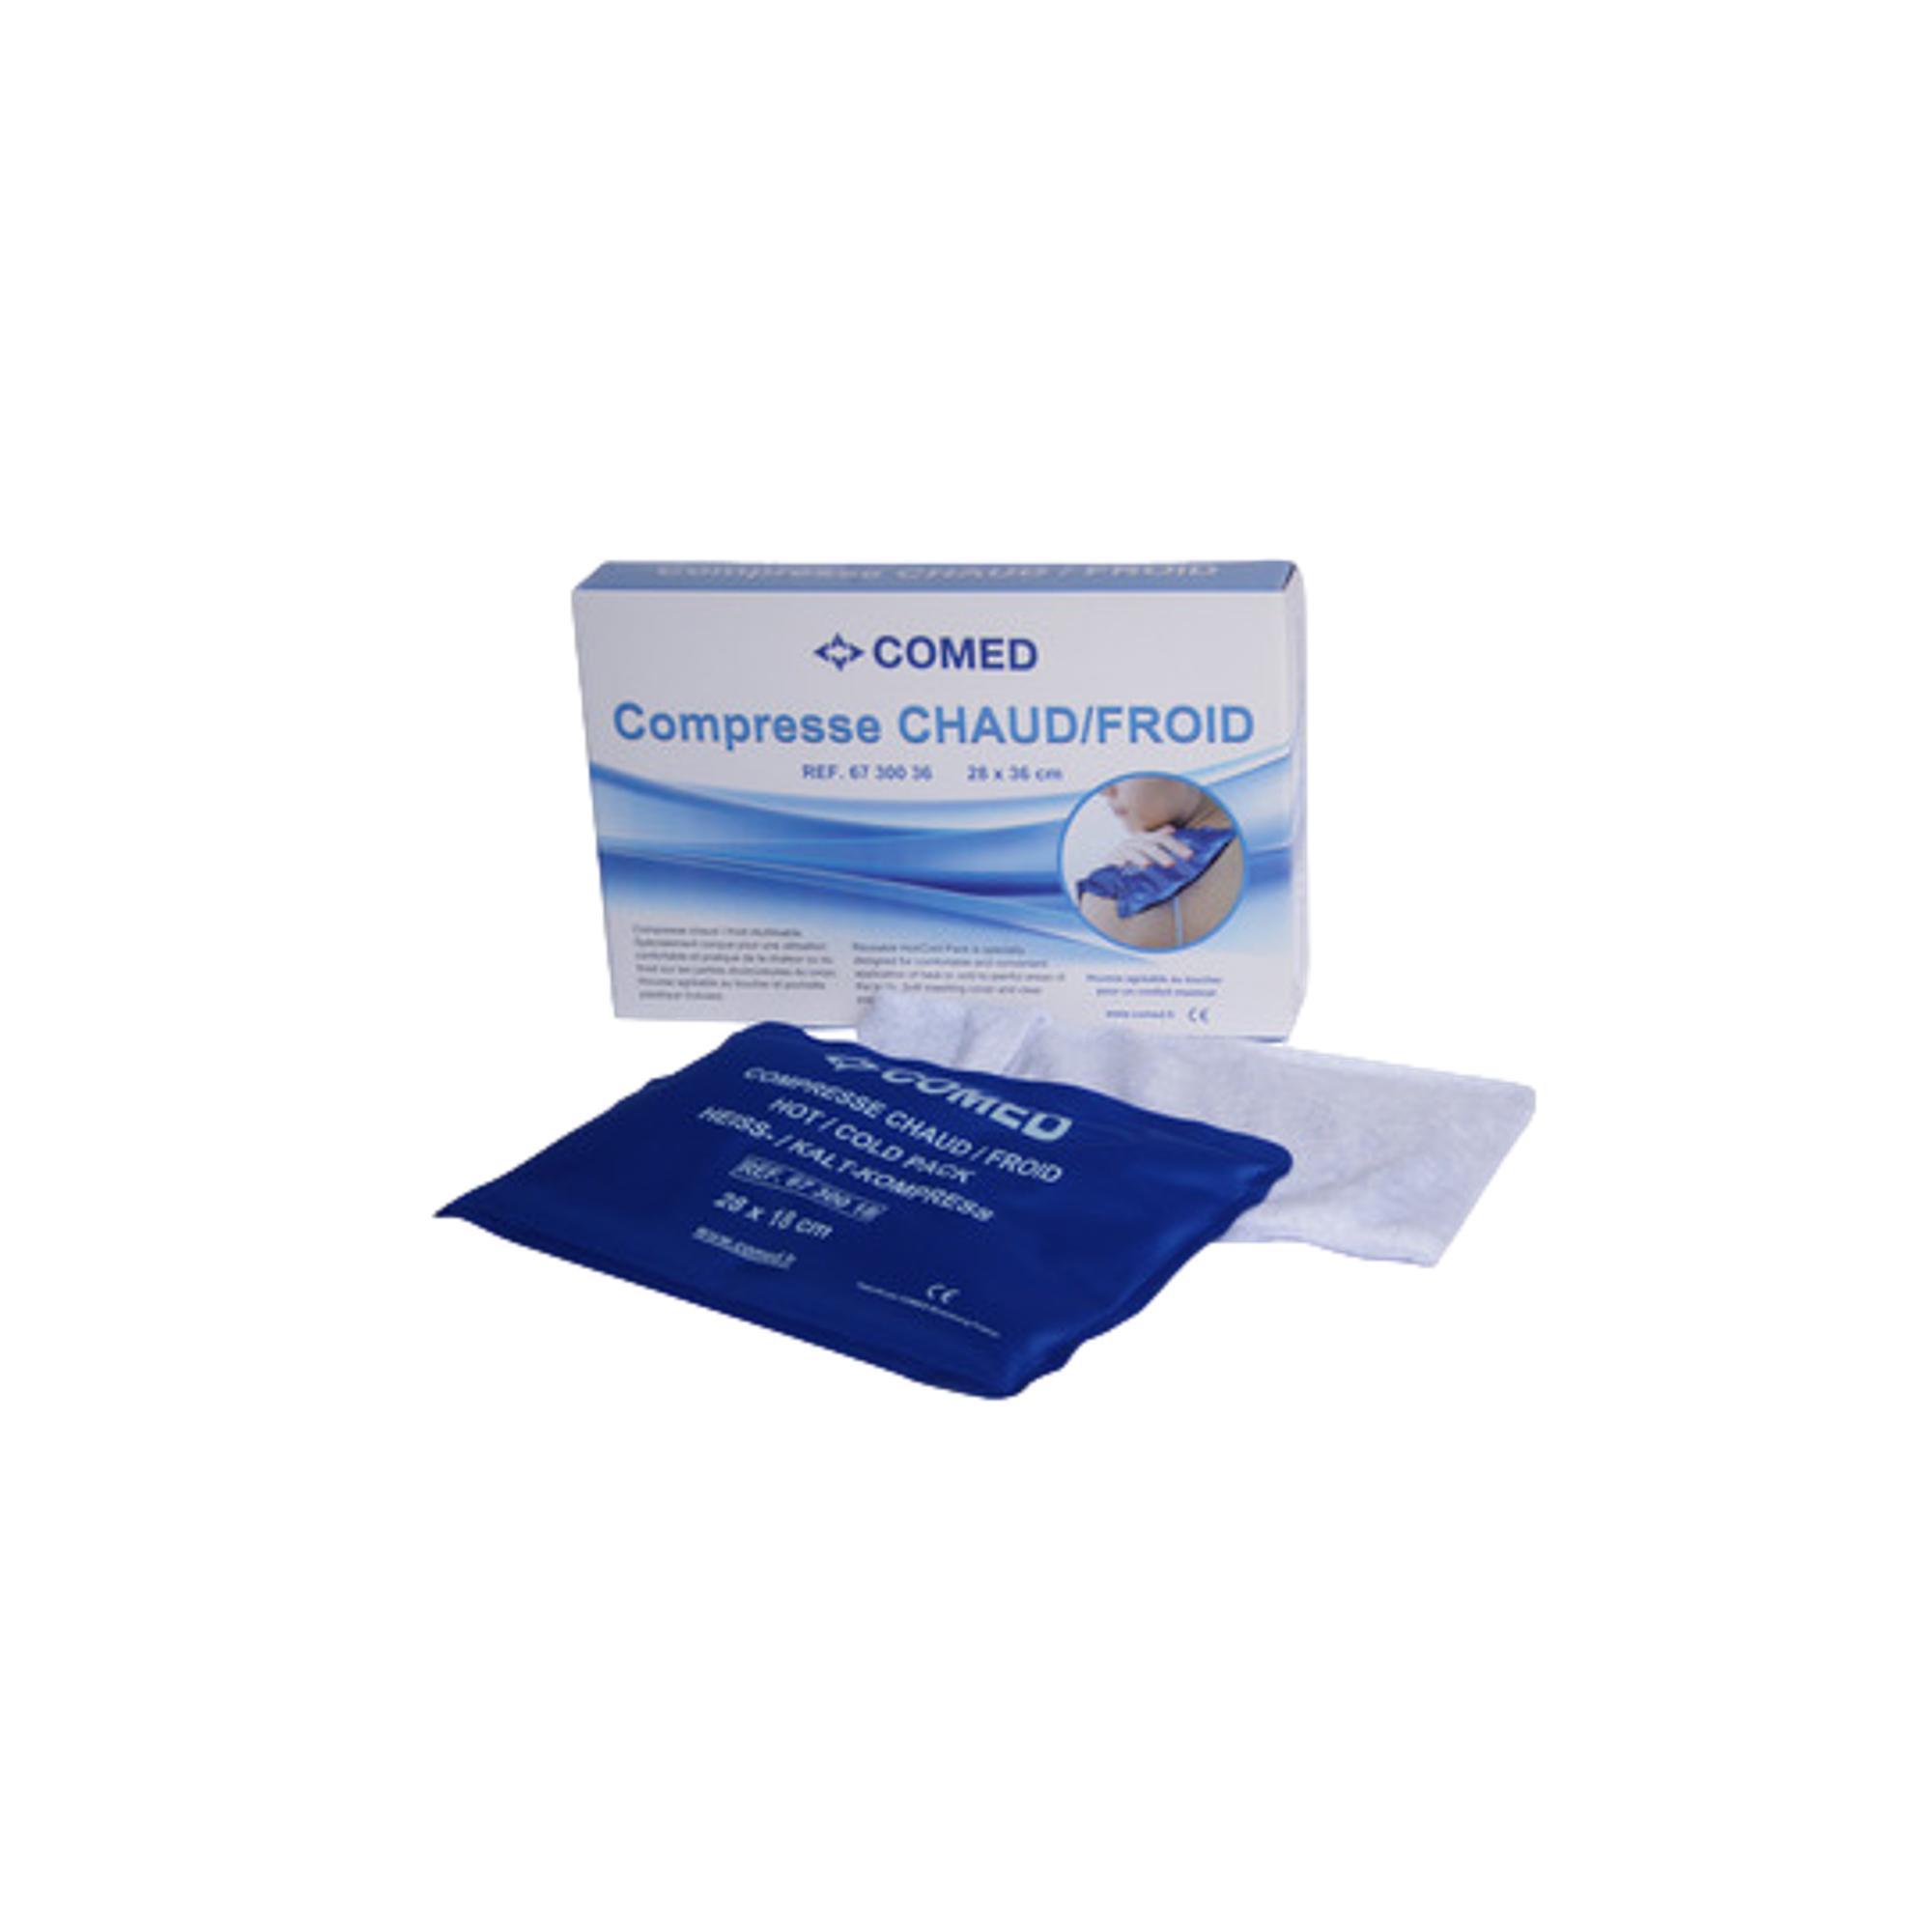 Compresse Chaud / Froid - Housse lavable - 3 tailles disponibles - Comed